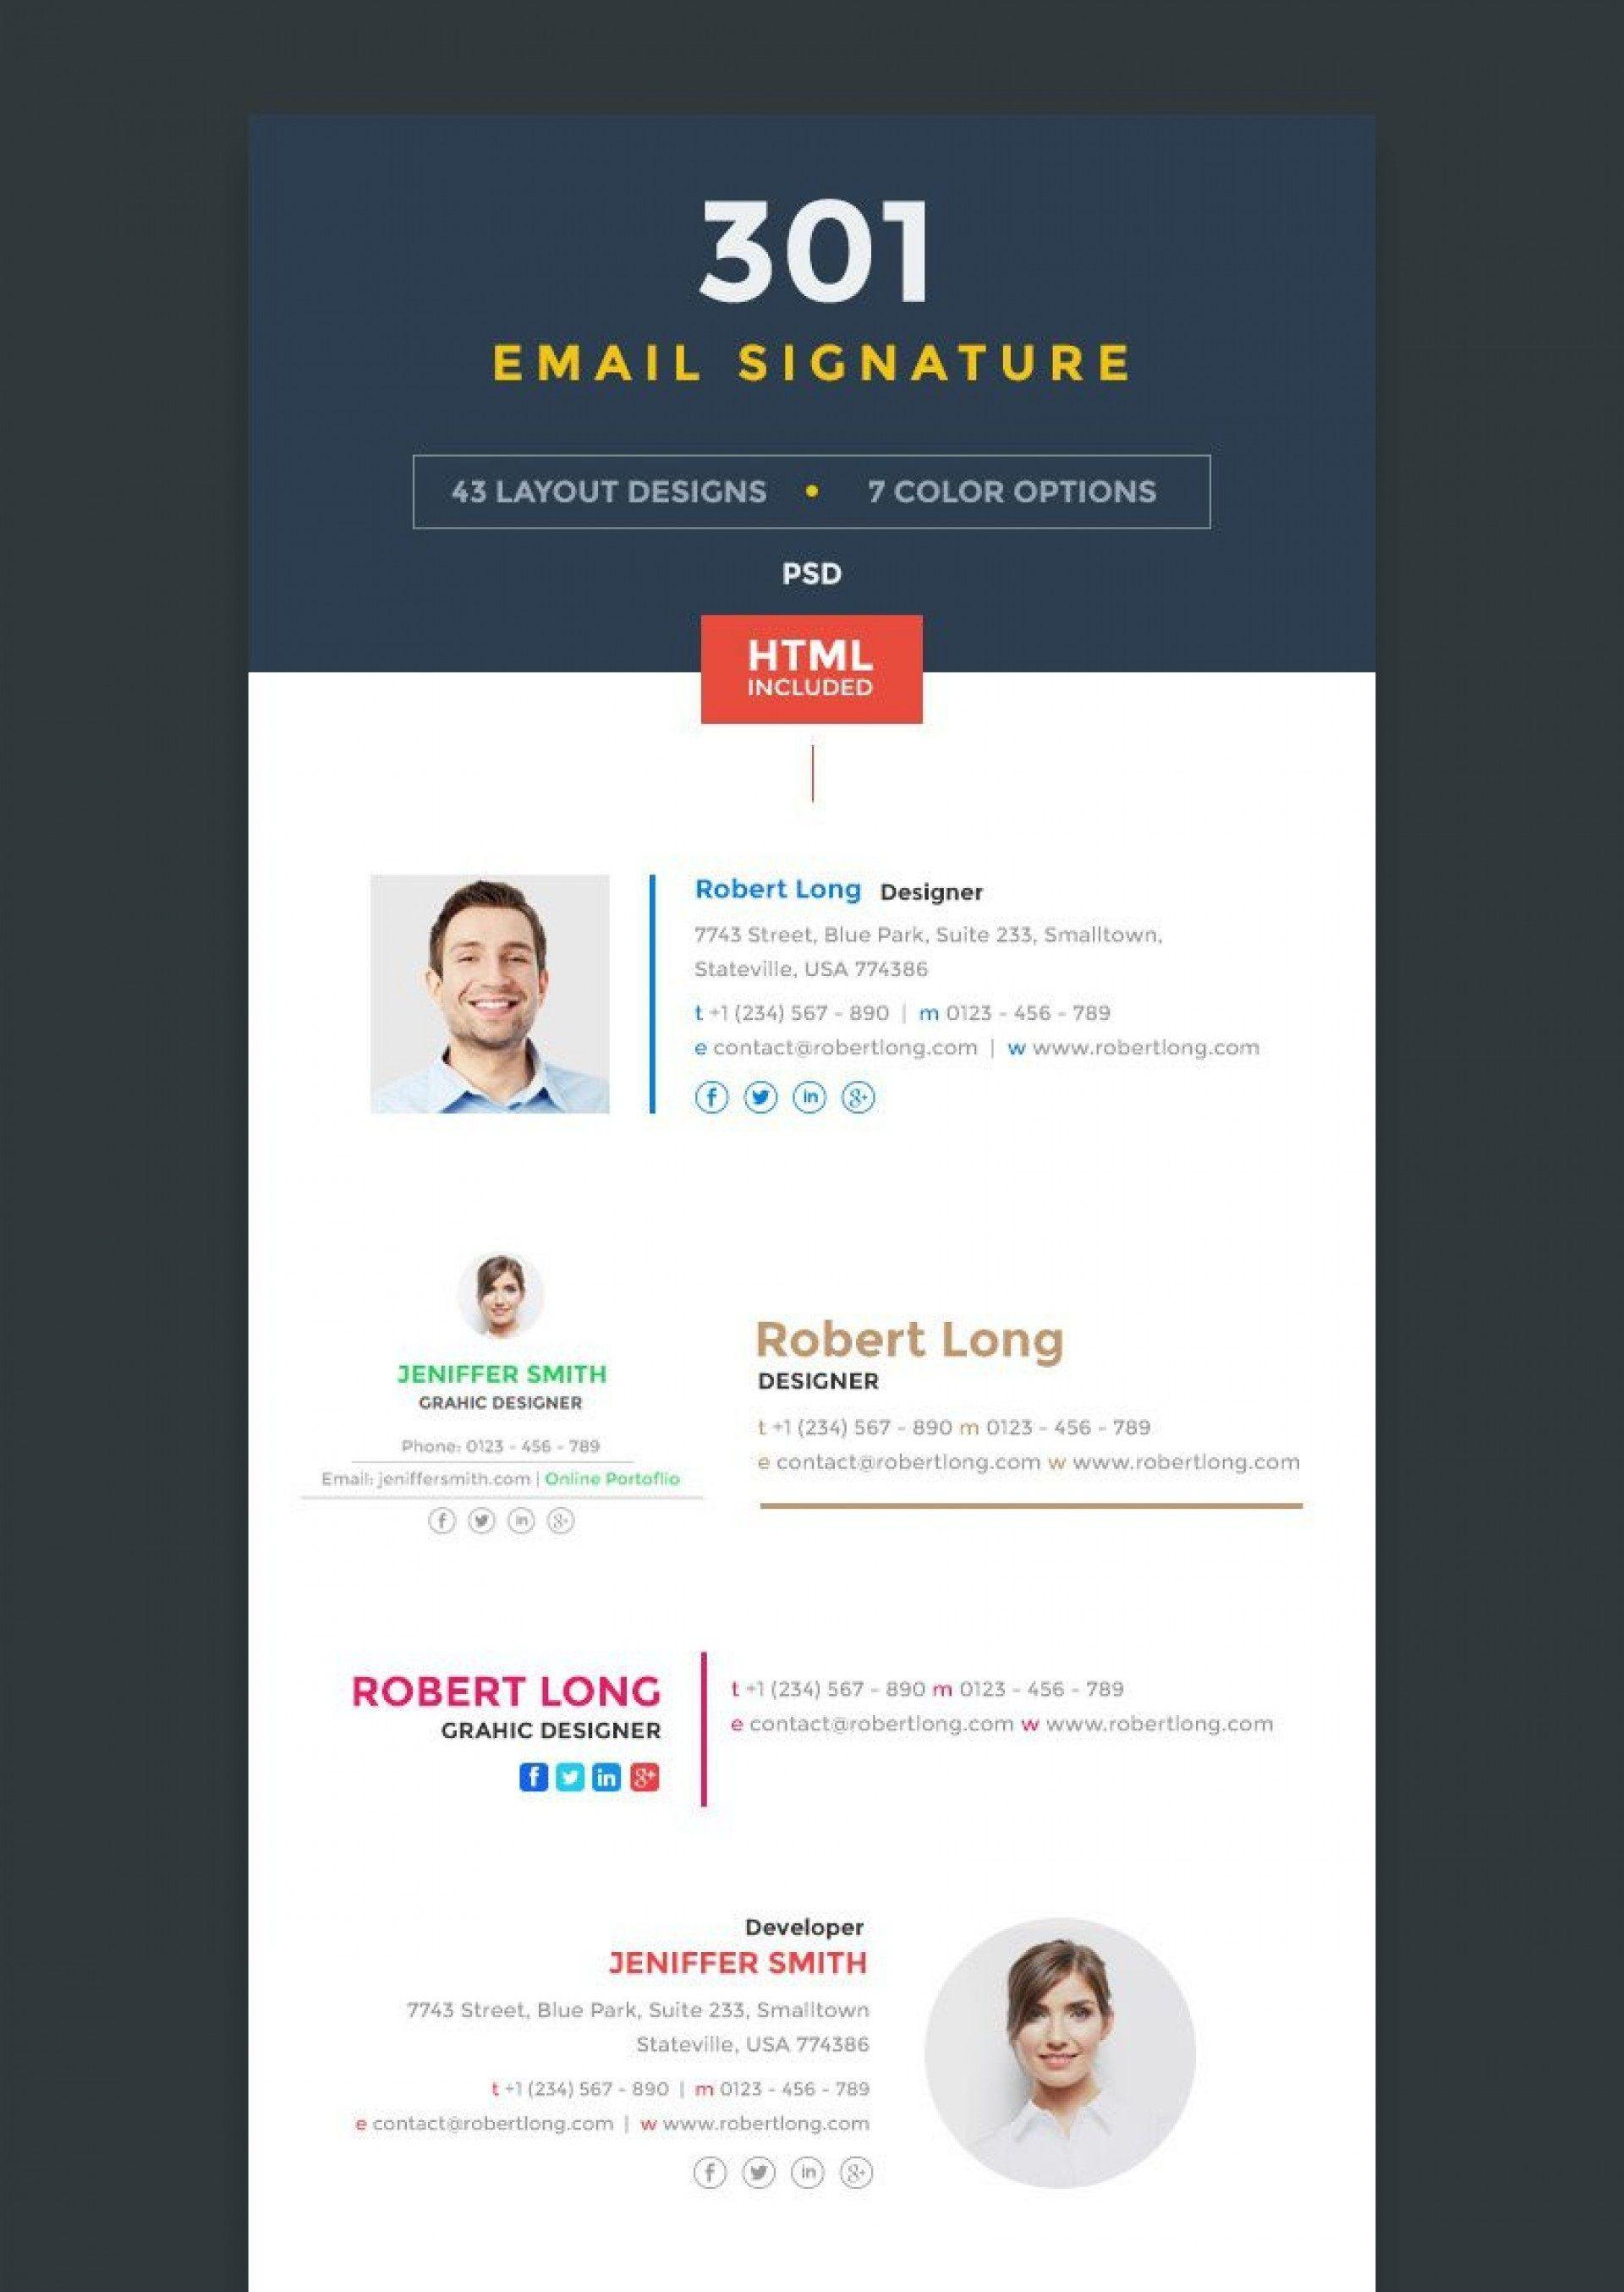 007 Shocking Email Signature Design Outlook Free Image 1920